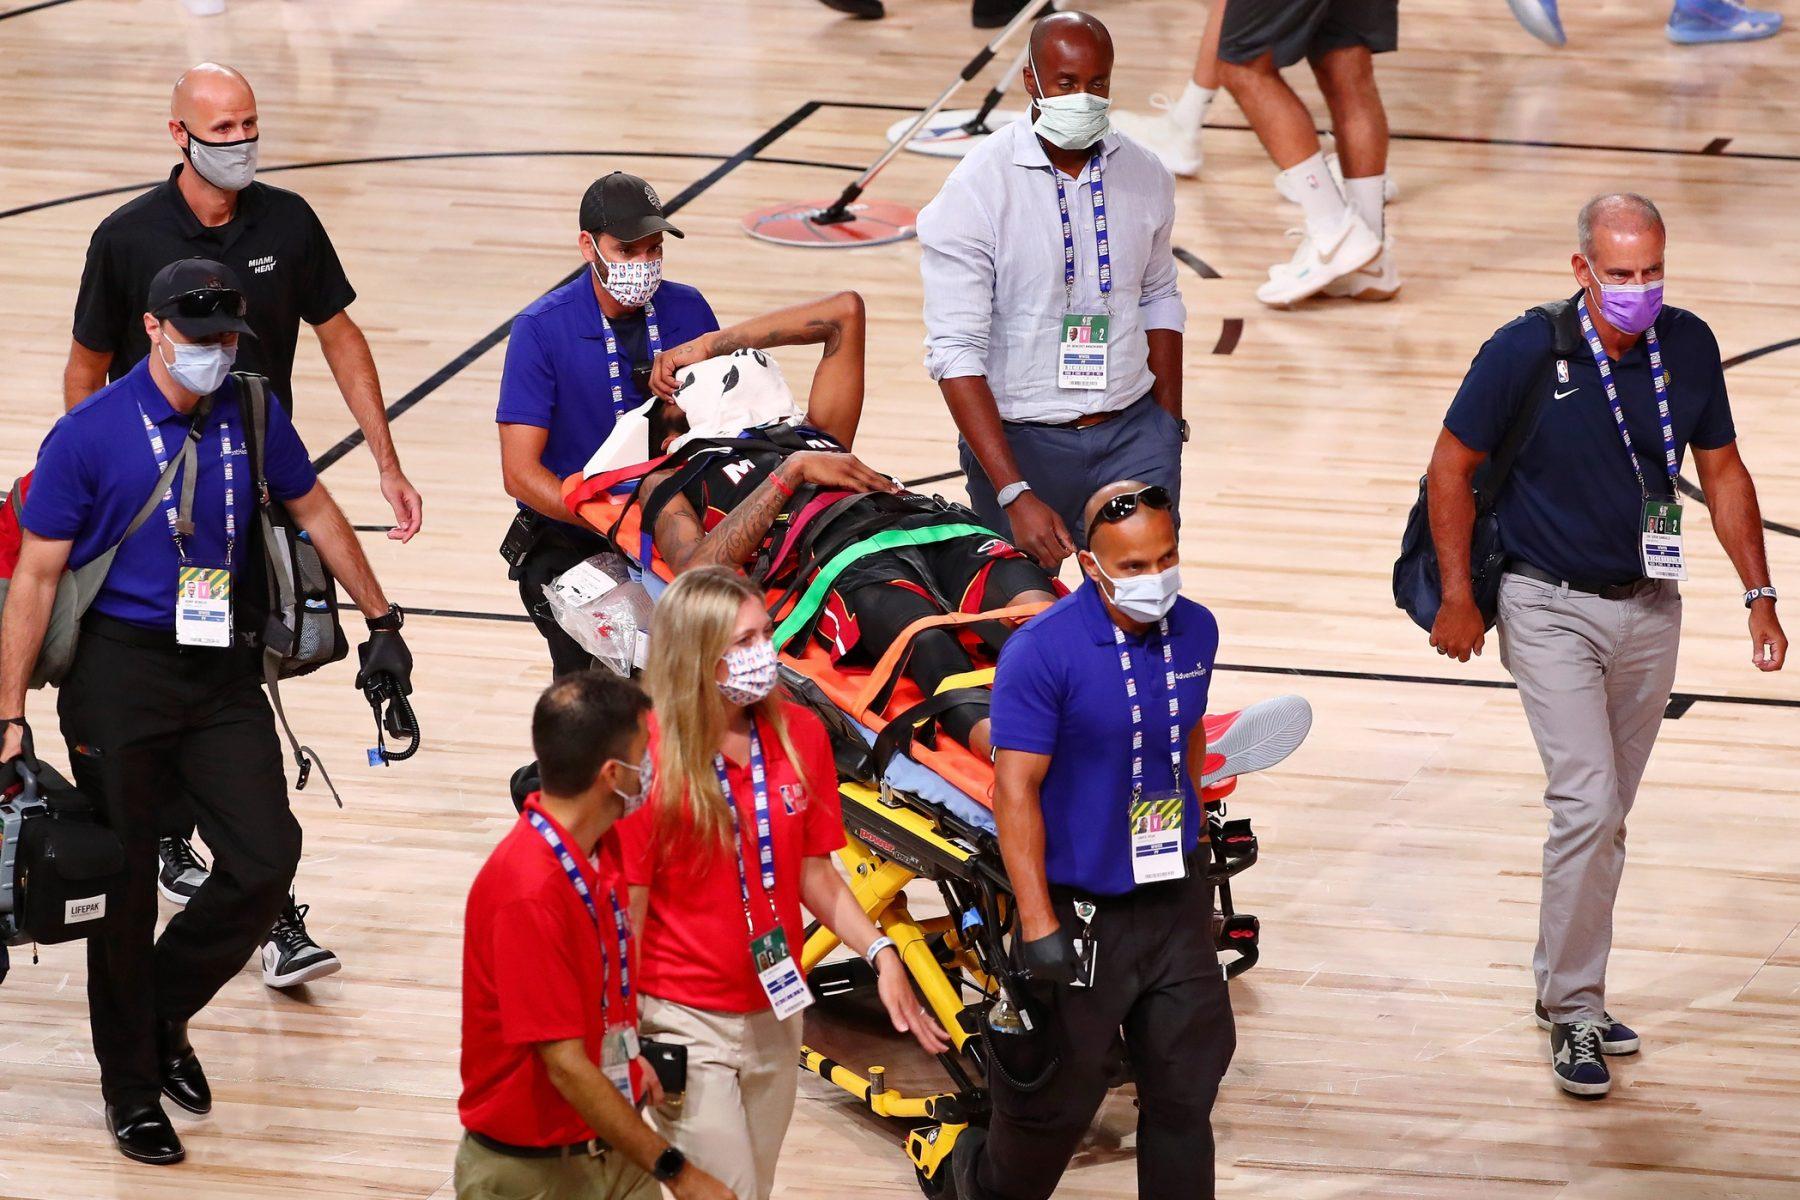 Heat beat Pacers in finale marred by Jones' injury